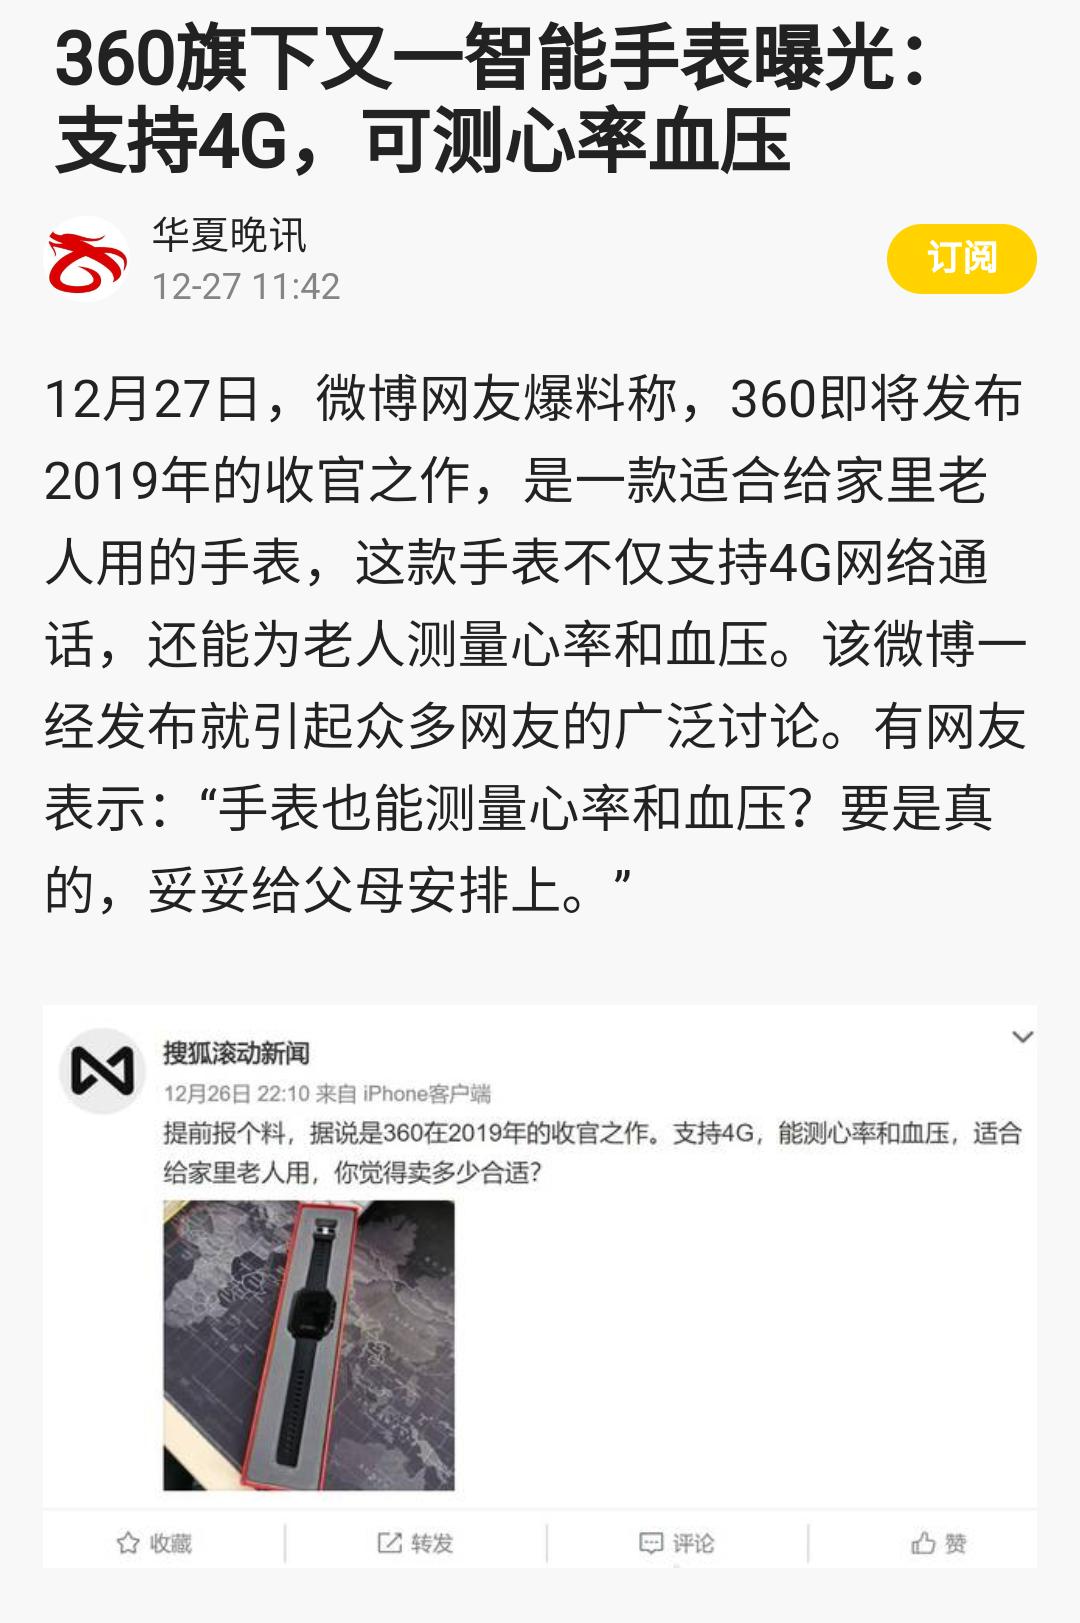 Screenshot_2019-12-28-11-21-02.png